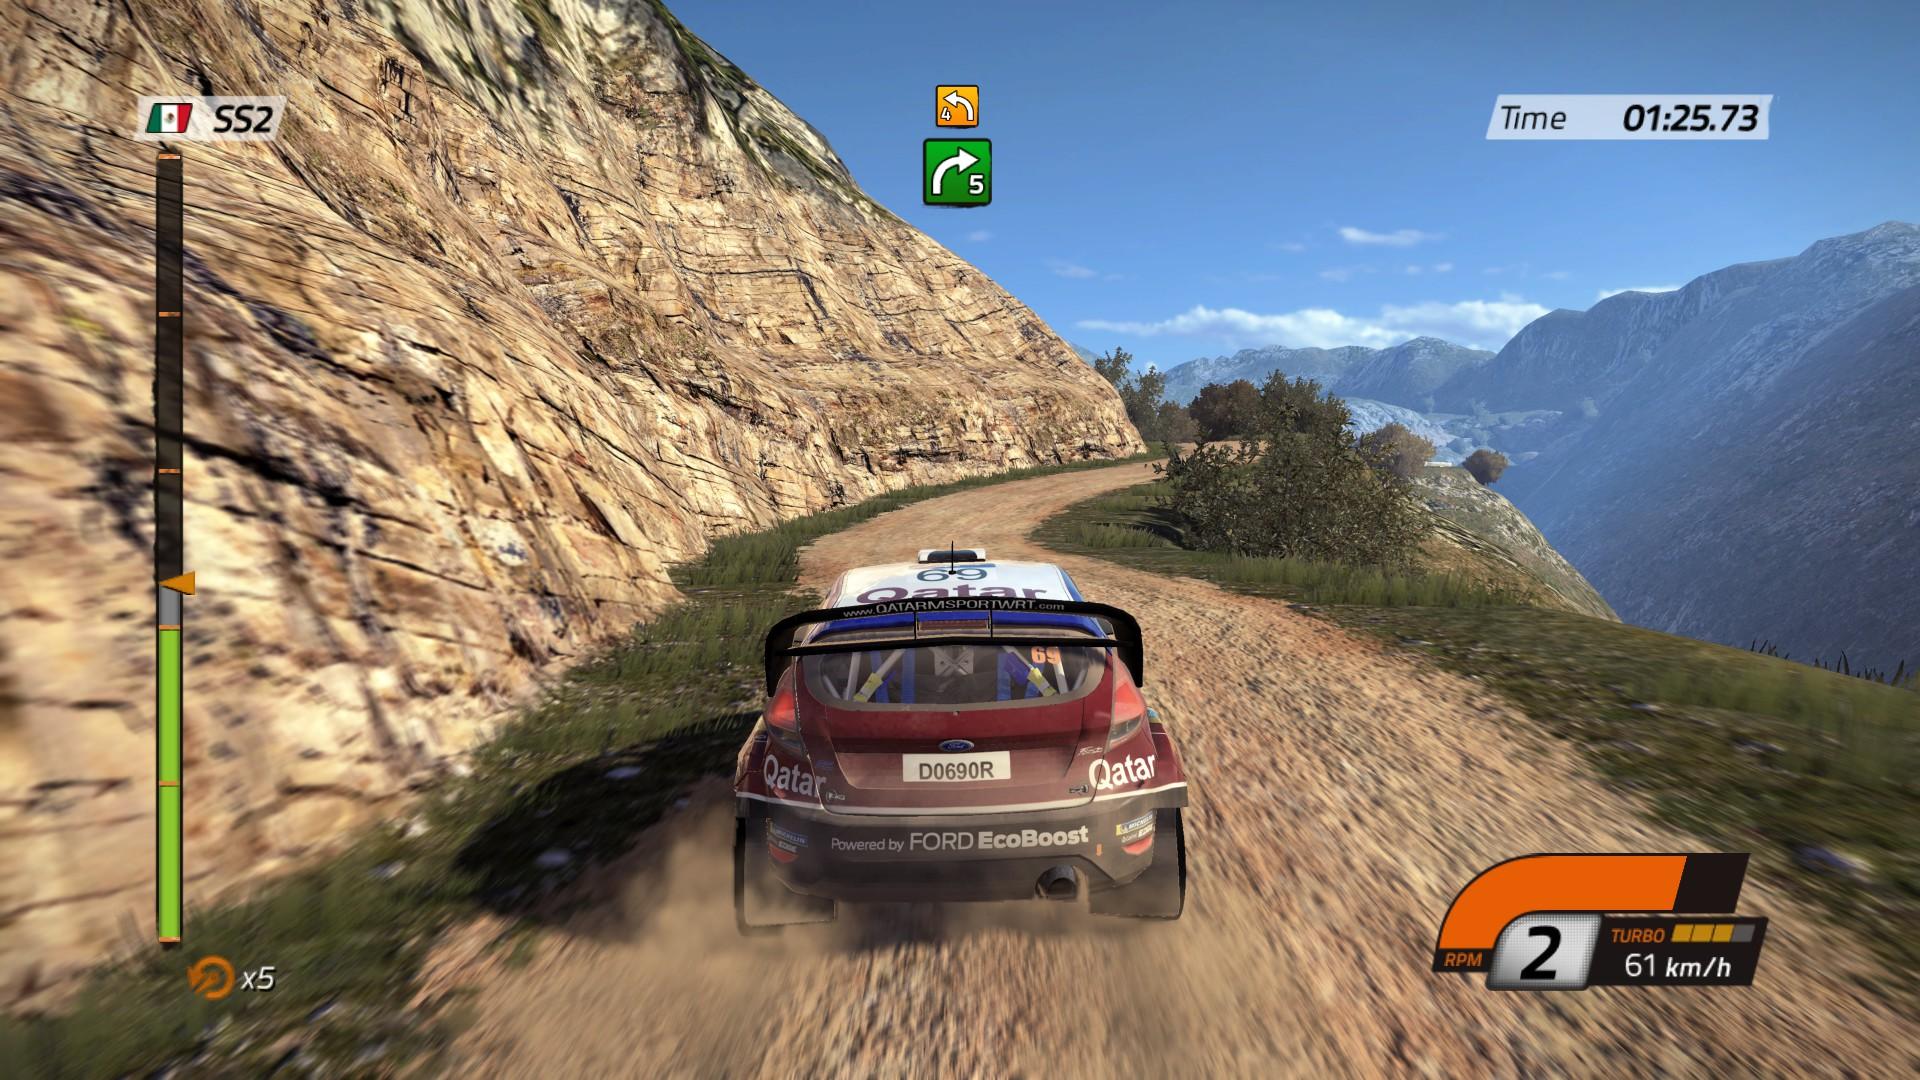 http://3rd-strike.com/wp-content/uploads/2013/11/WRC-4-Stage.jpg